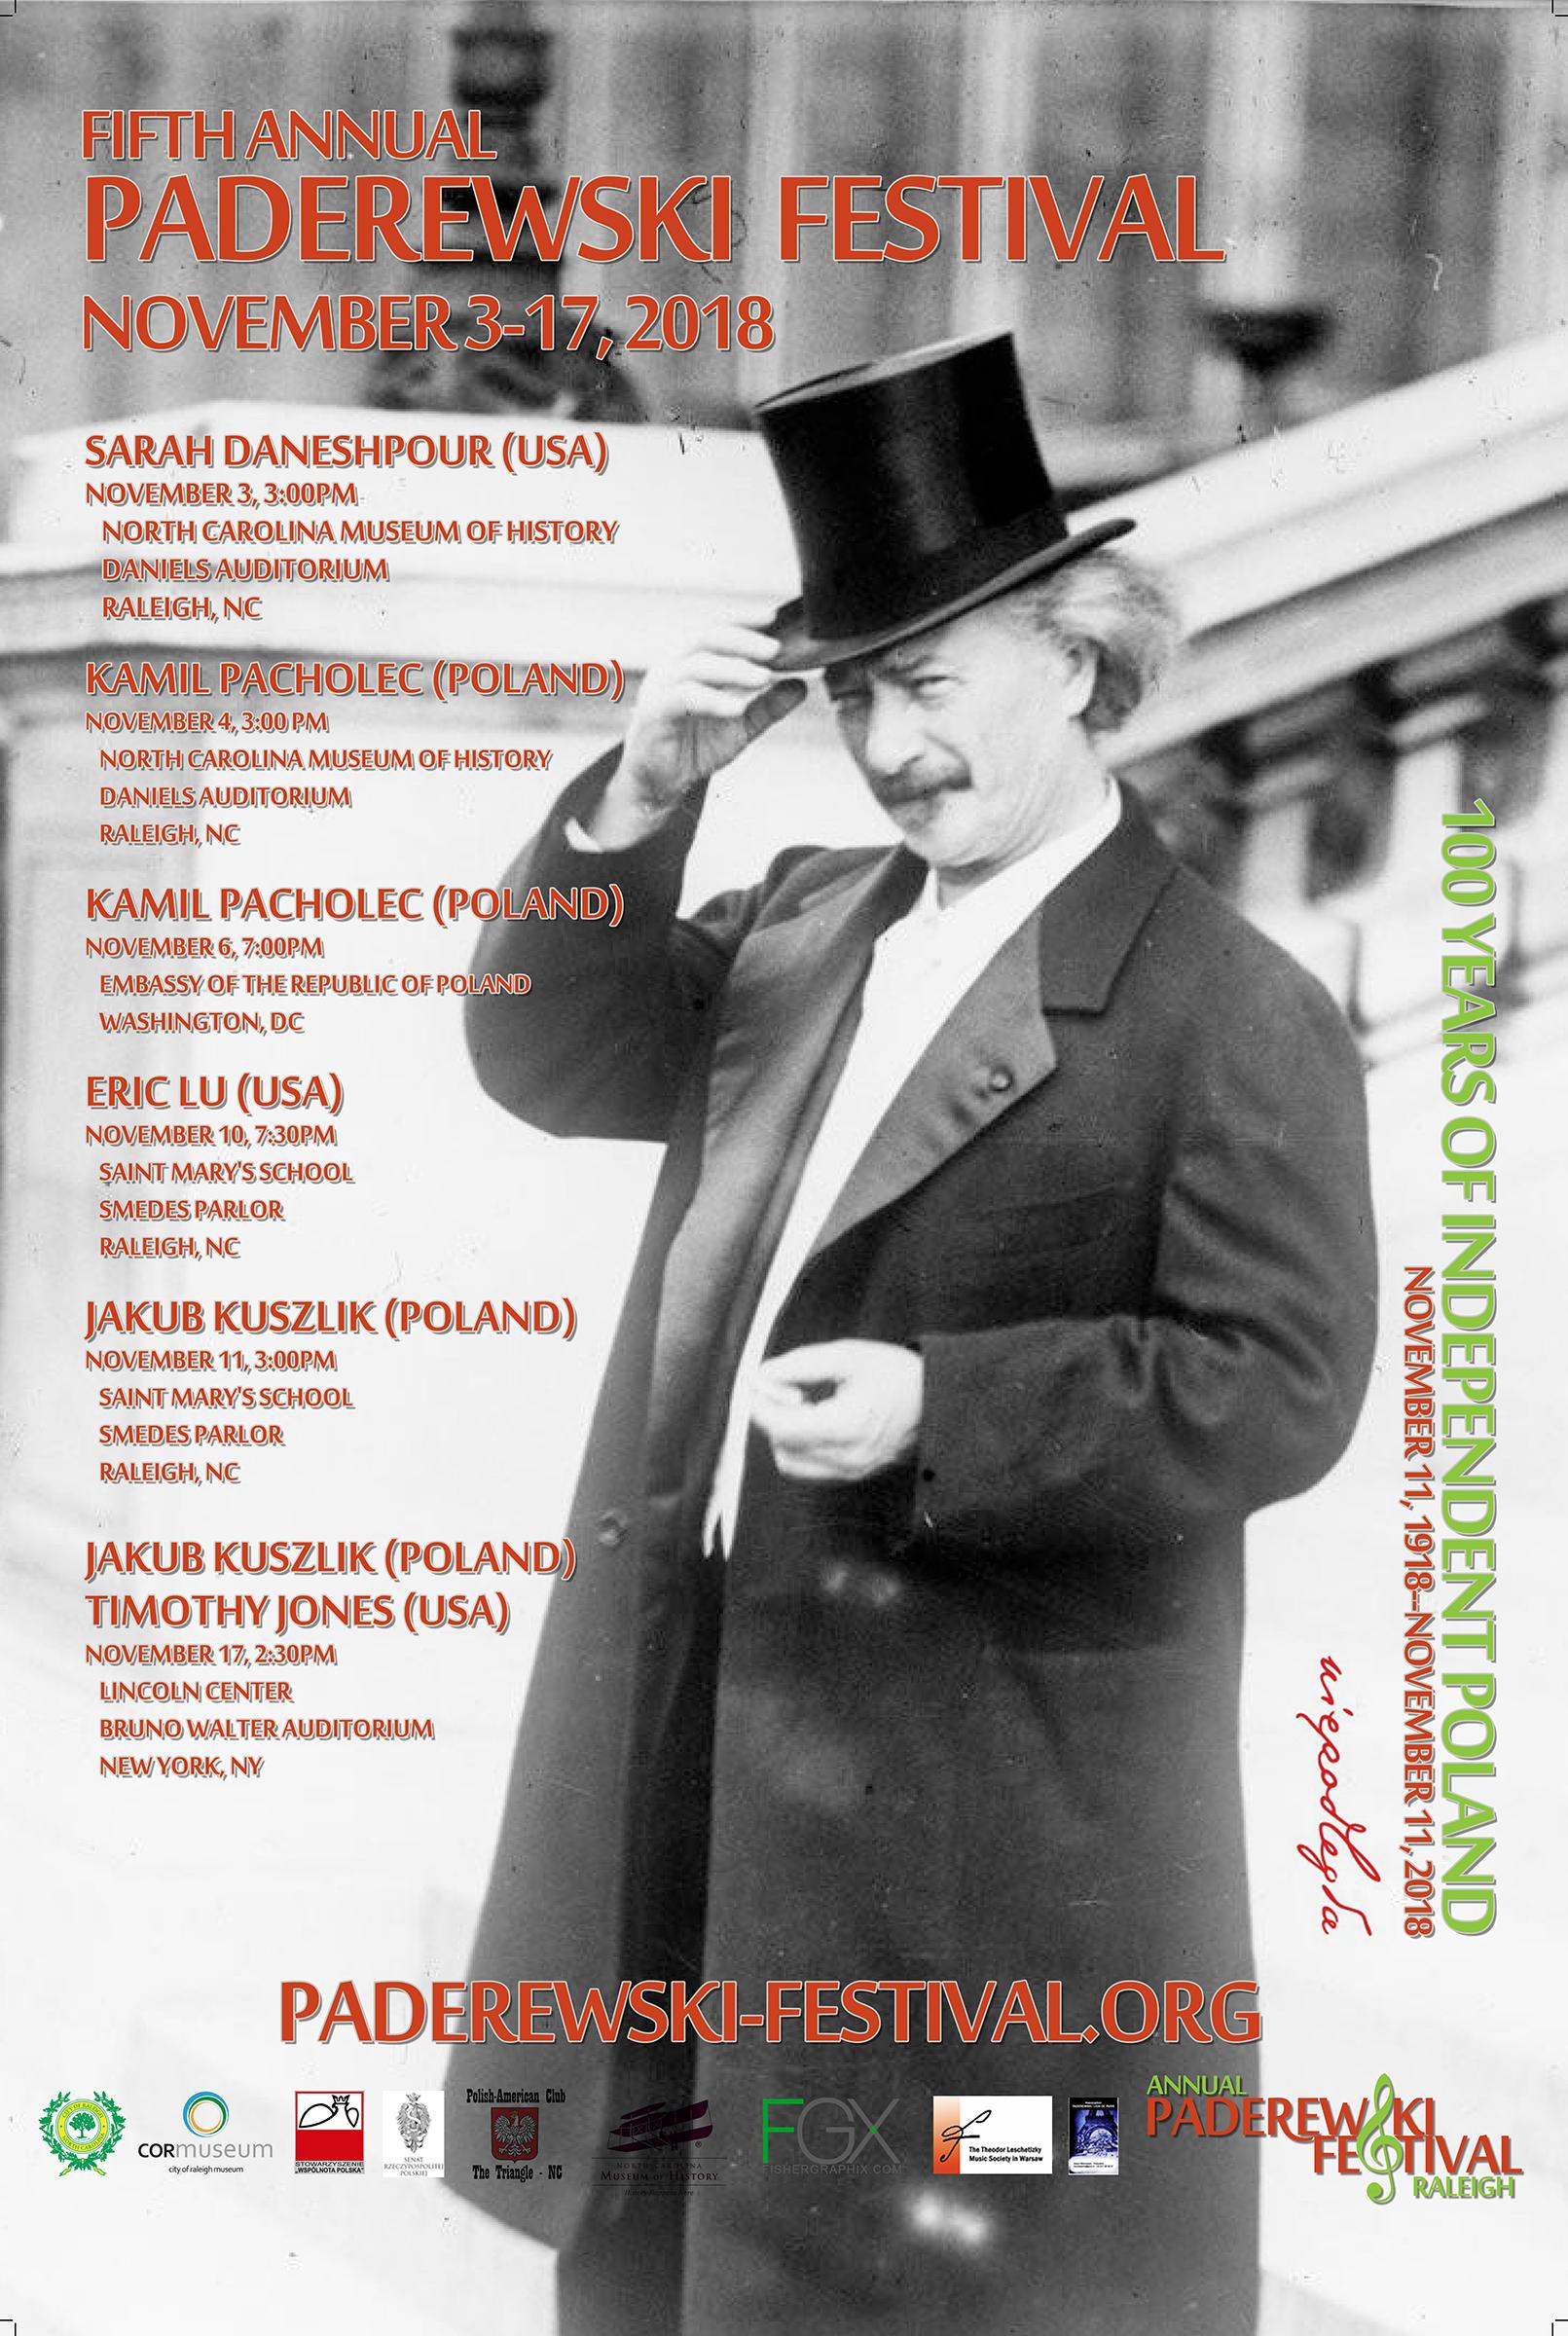 2018 Poster FINAL paderewski poster - 2017 - 24x36 w crop - small.jpg